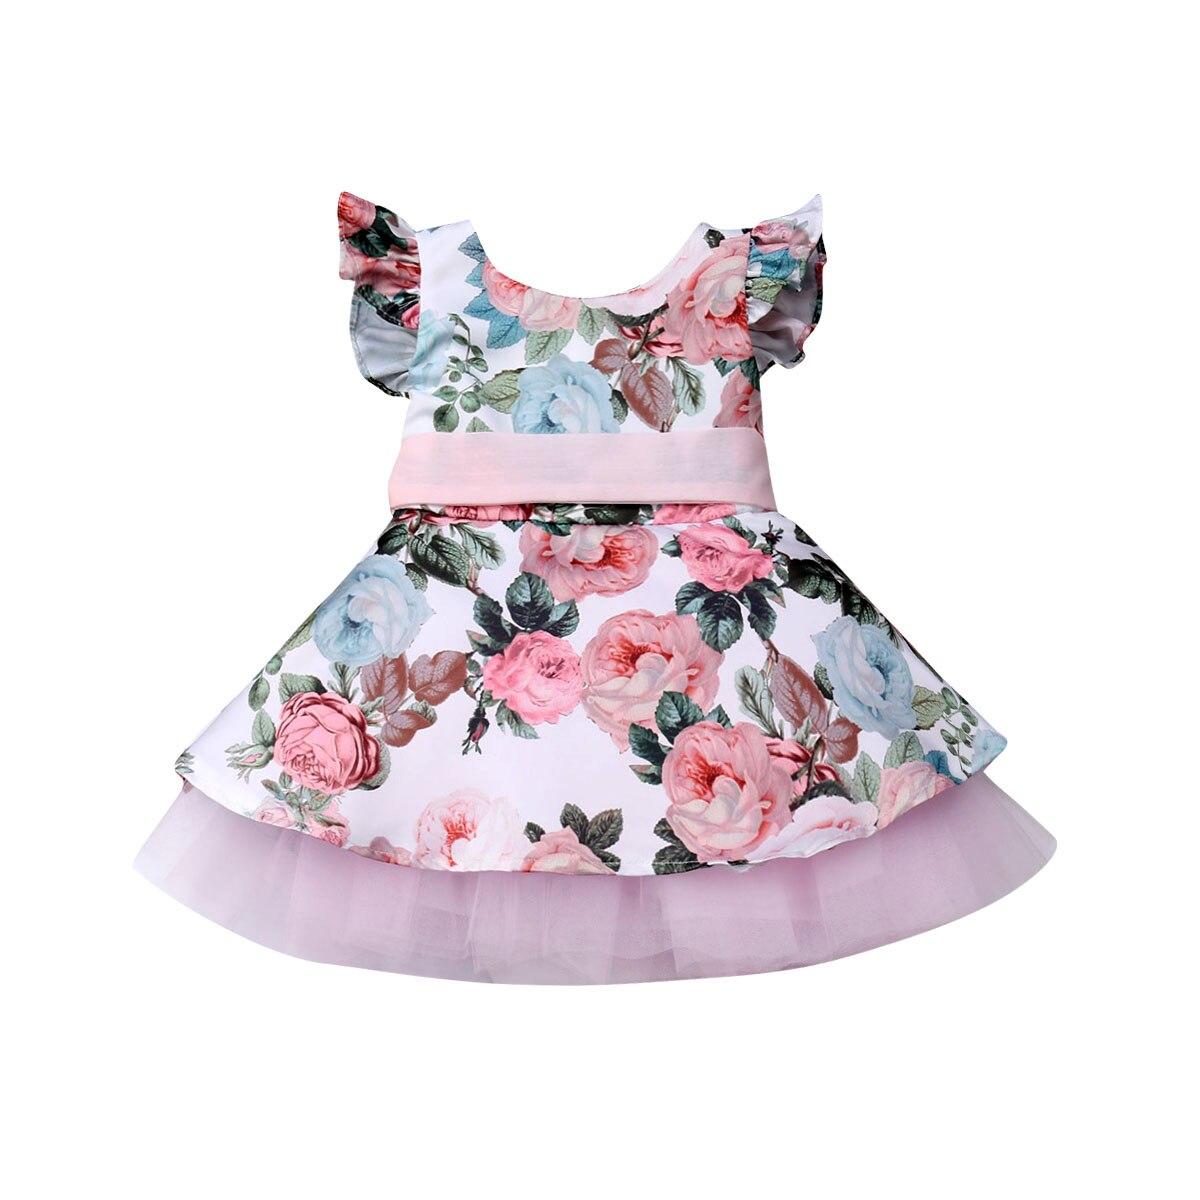 Toddler Kids Baby Girls Flower Party Pageant Lace Tutu Dress Sundress Summer USA